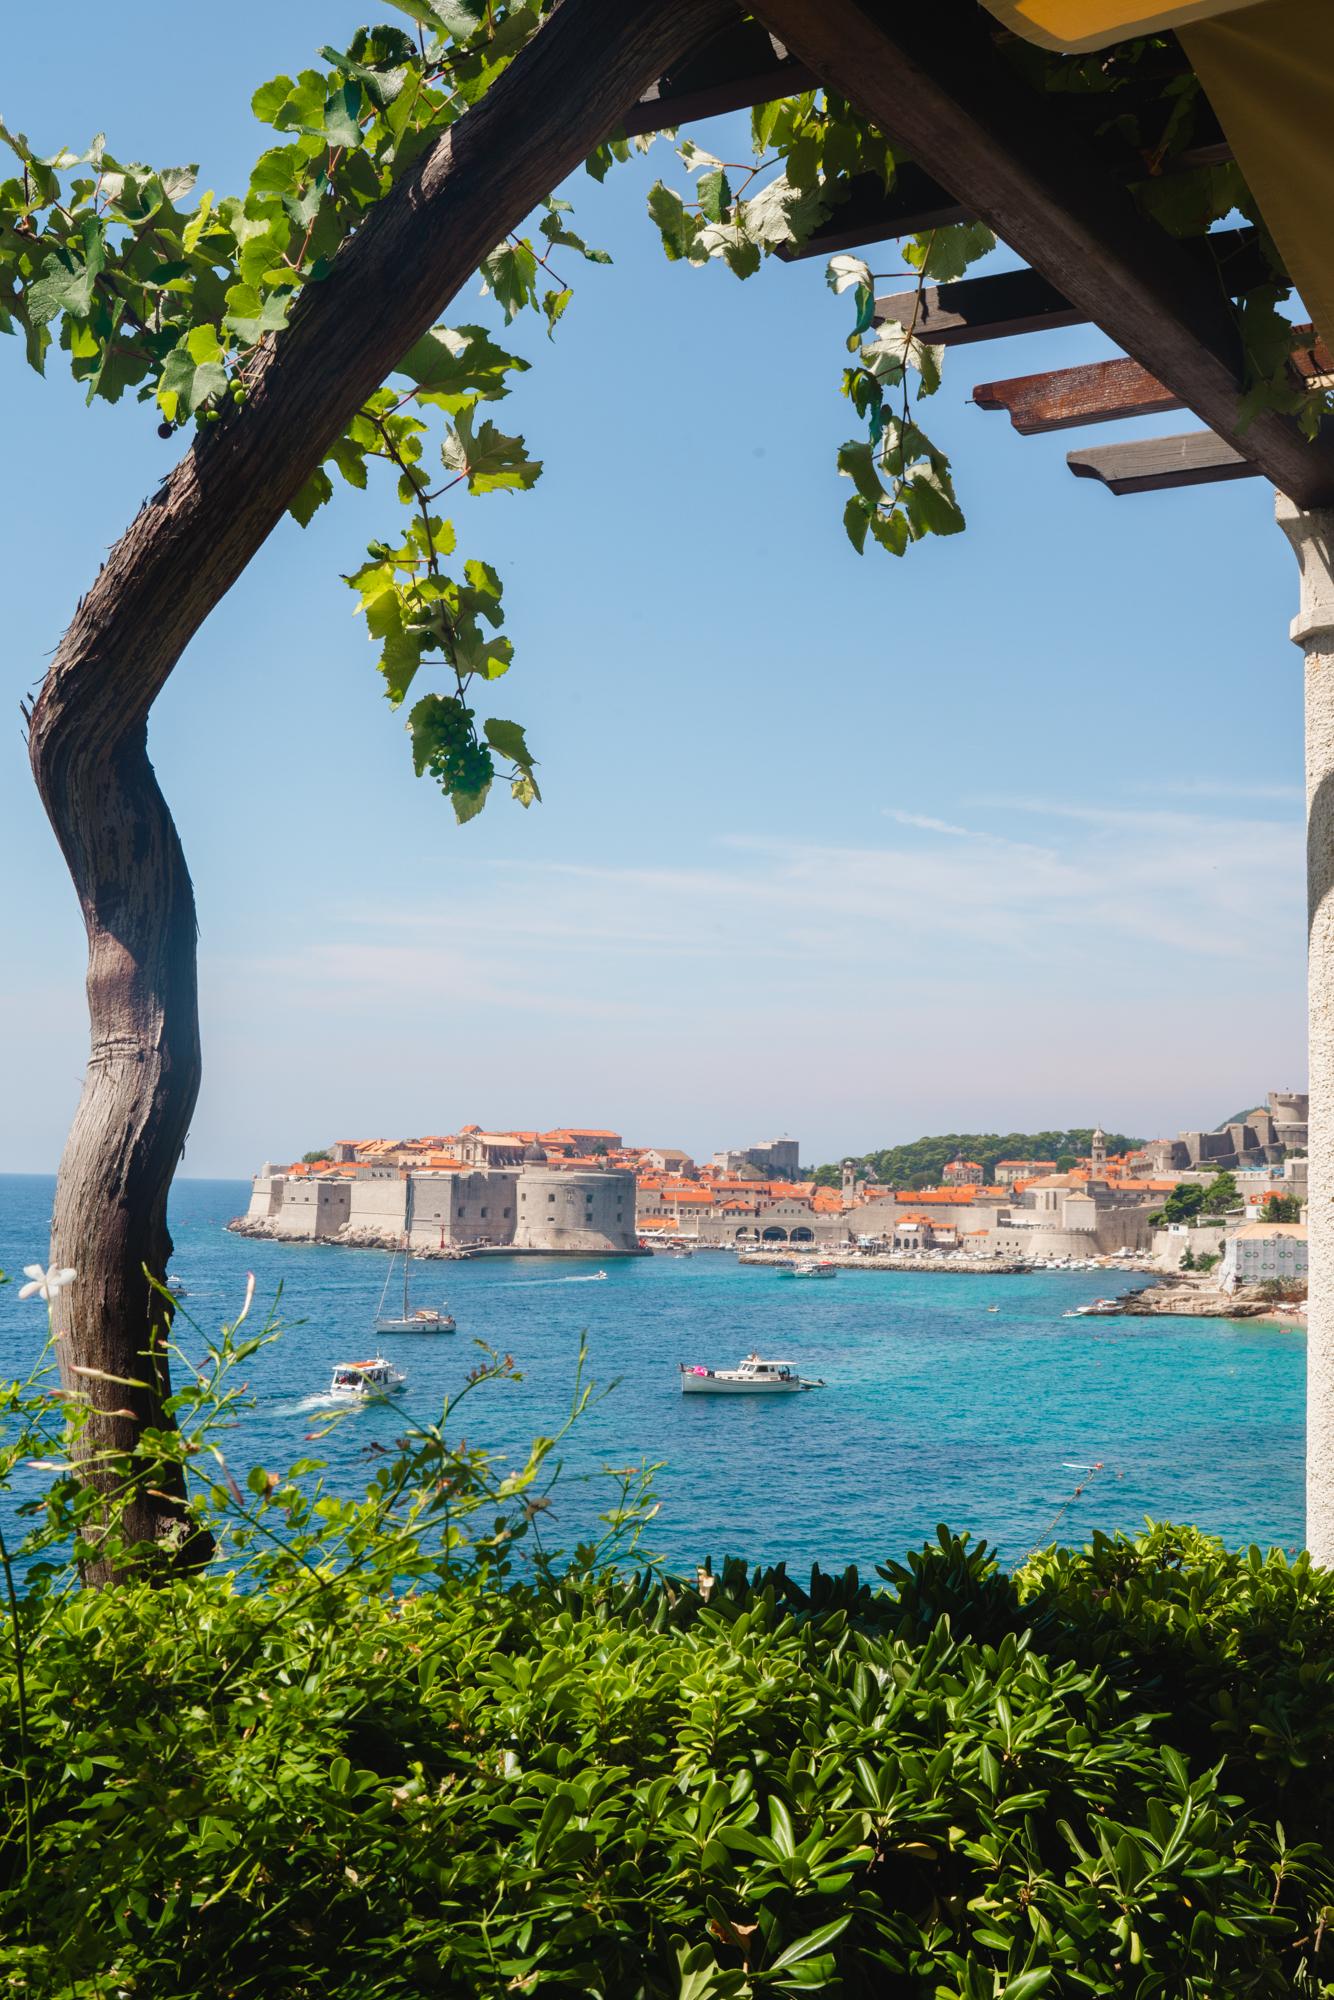 Travel Guide for Dubrovnik, Croatia